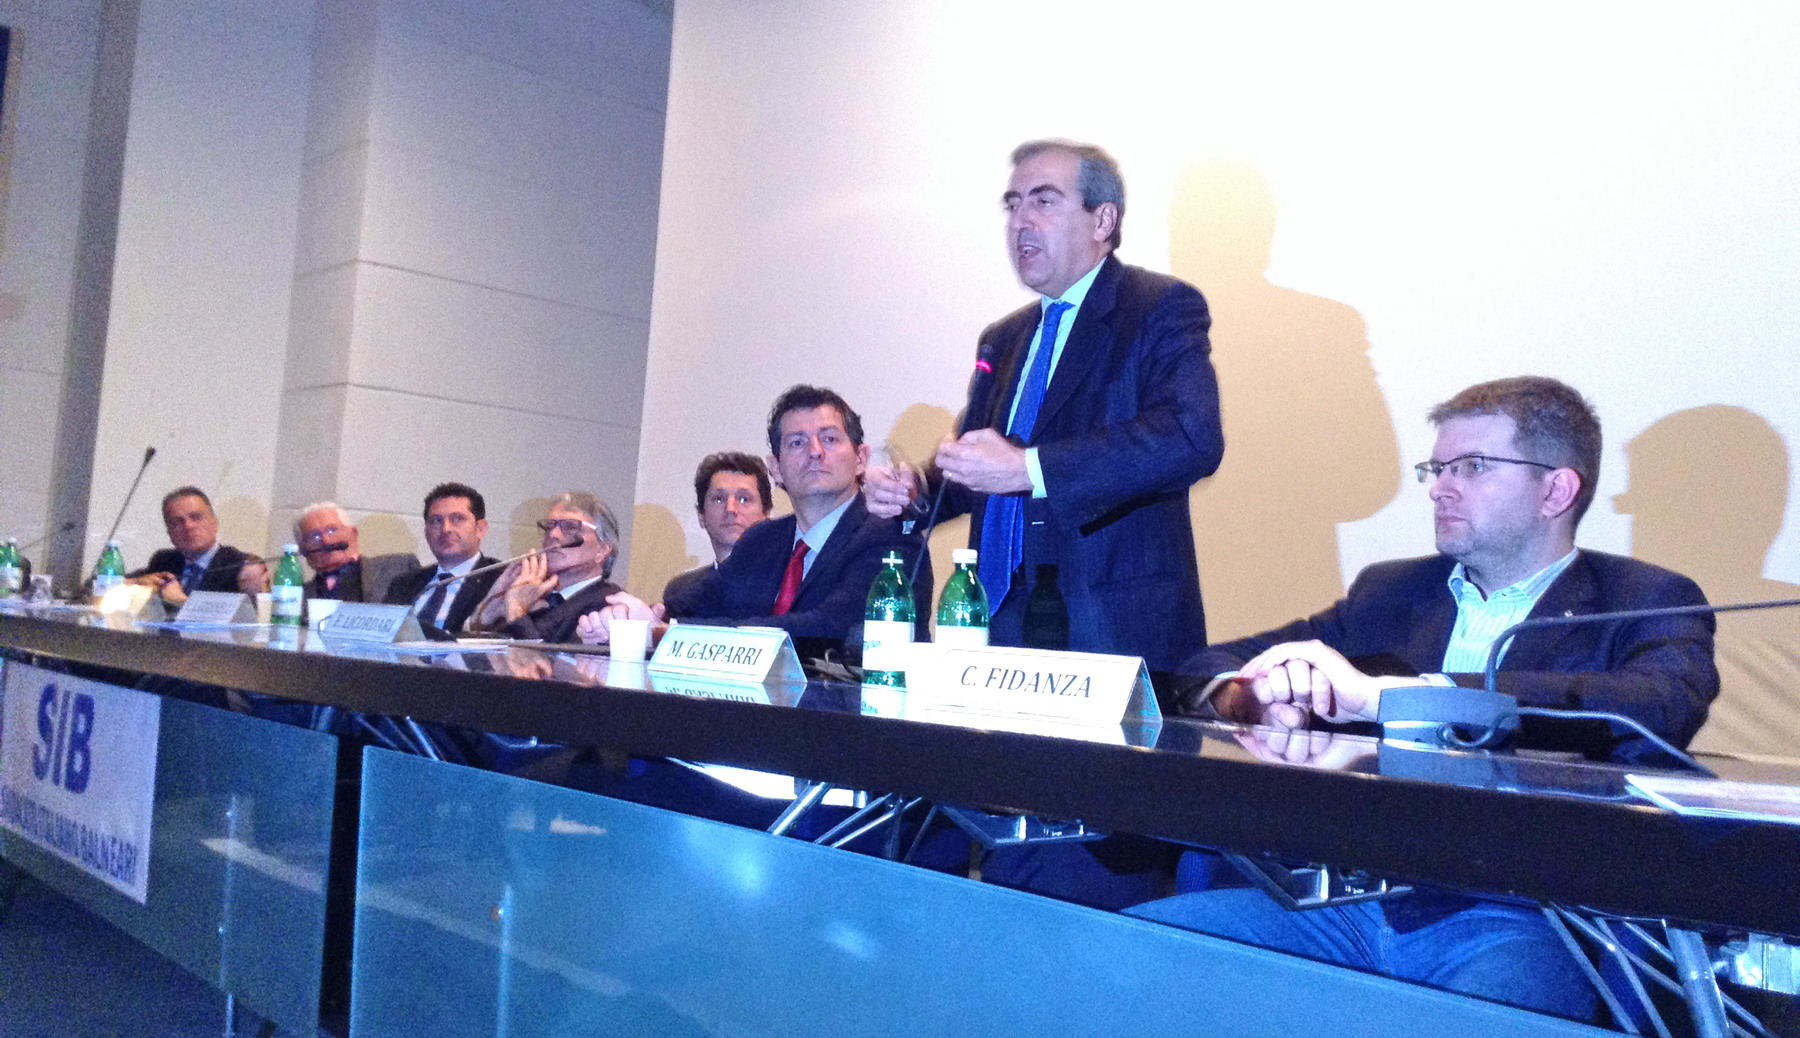 A Balnearia le imprese chiedono certezze sul futuro ai parlamentari nazionali ed europei